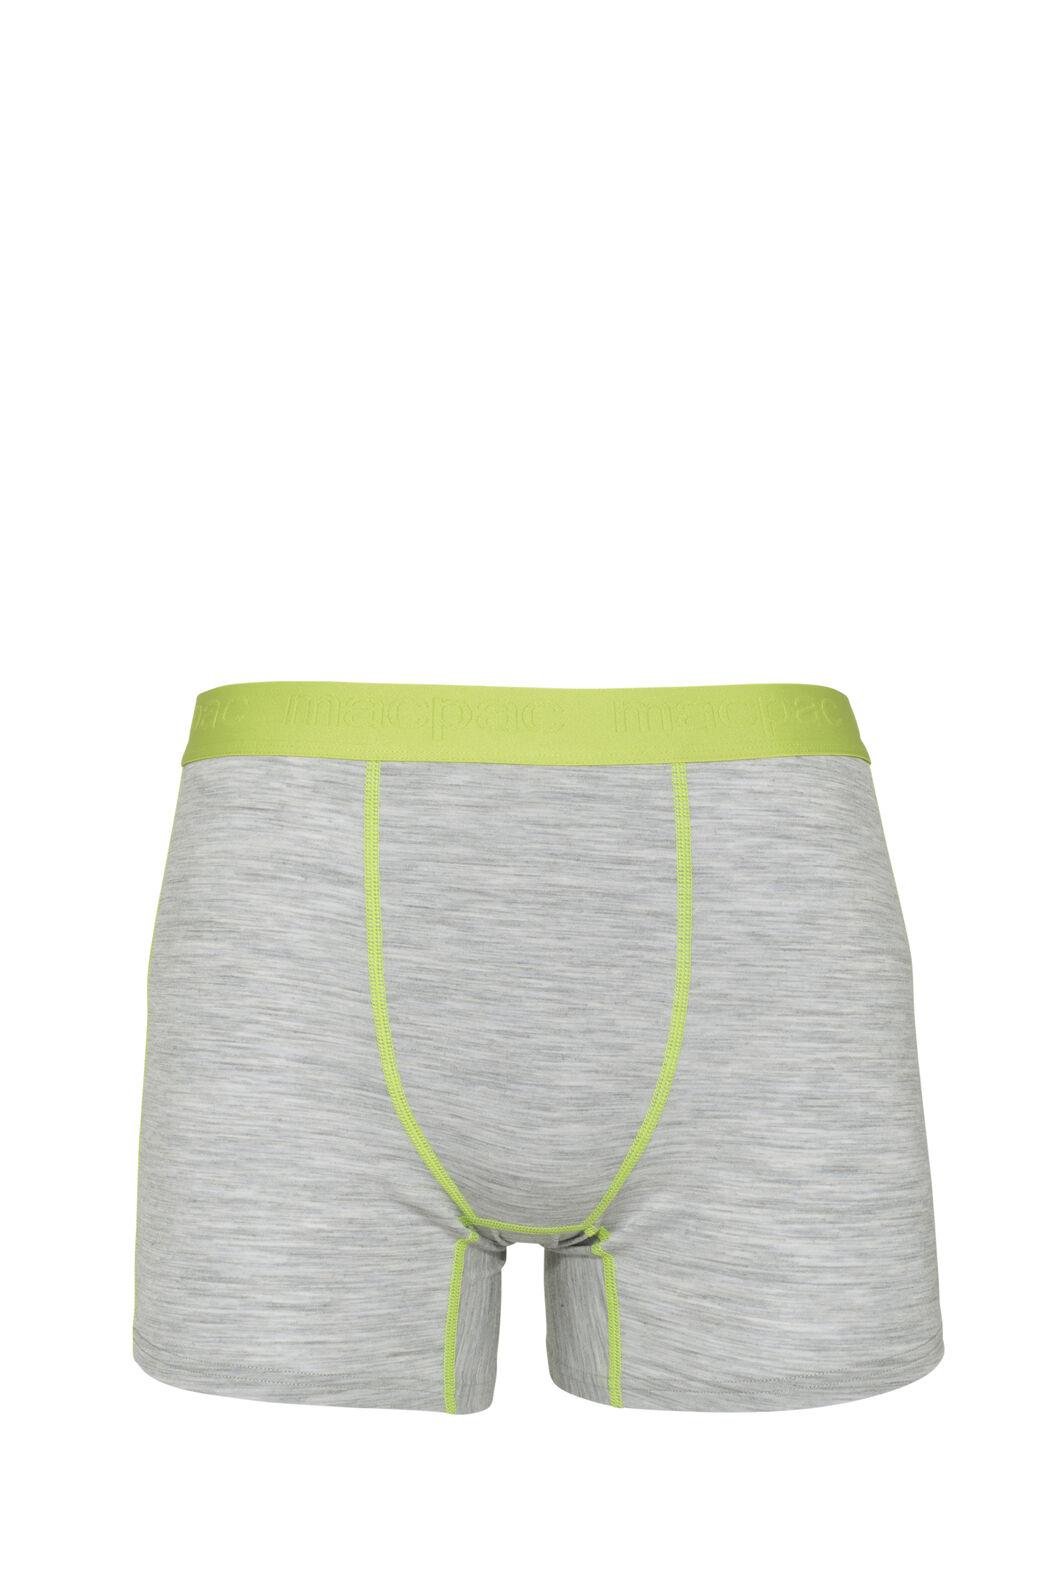 Macpac 180 Merino Boxers — Men's, Light Grey Marle/Macaw Green, hi-res